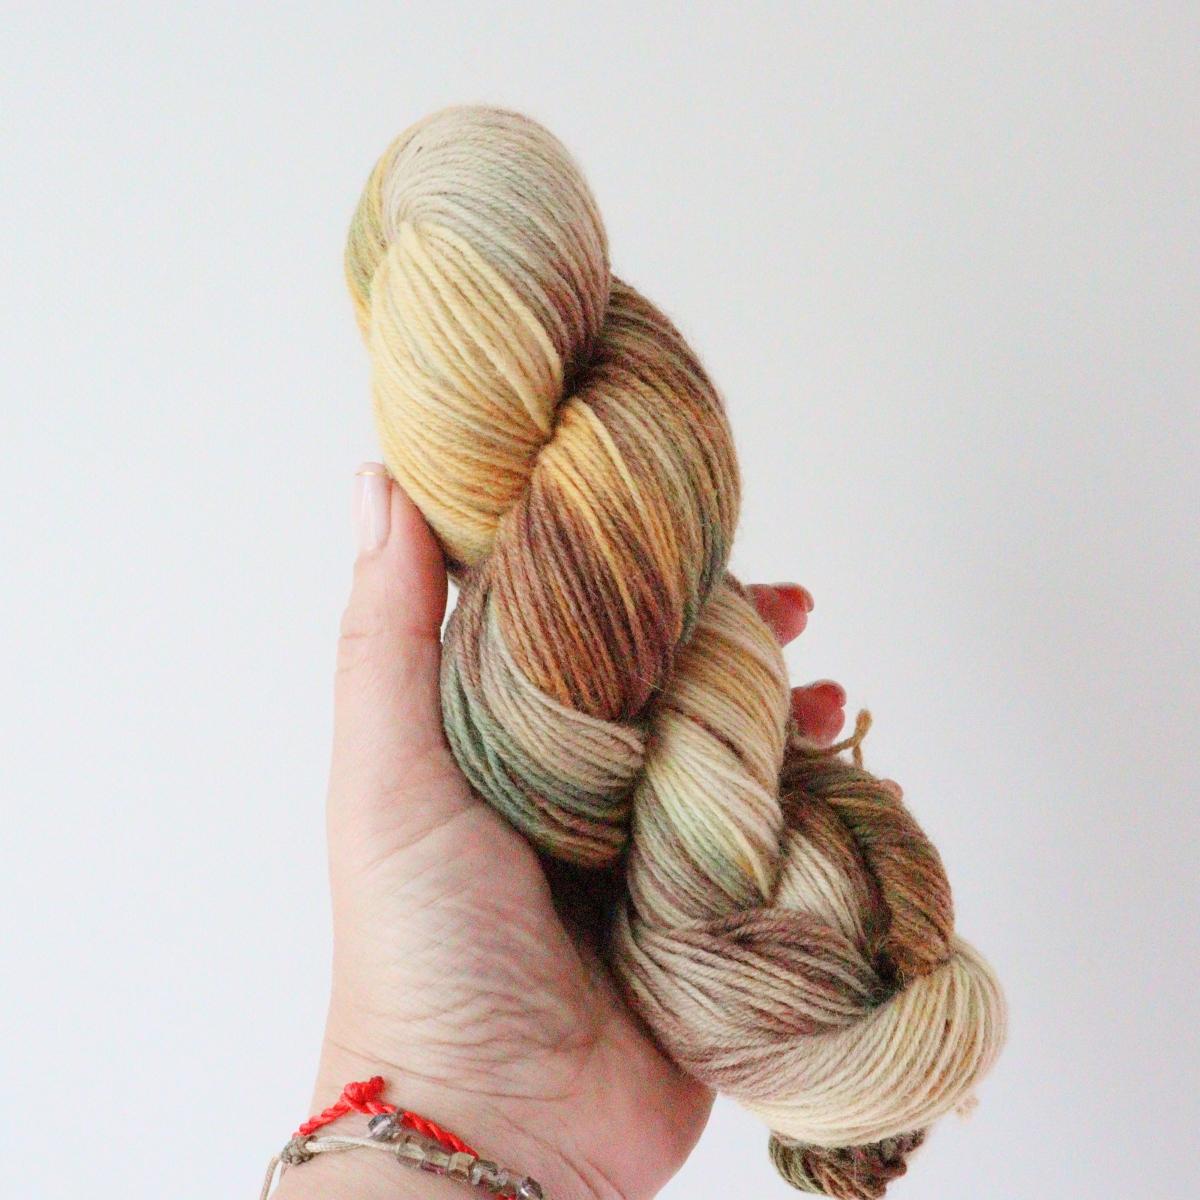 woodico.pro hand dyed yarn 088 6 1200x1200 - Hand dyed yarn / 088